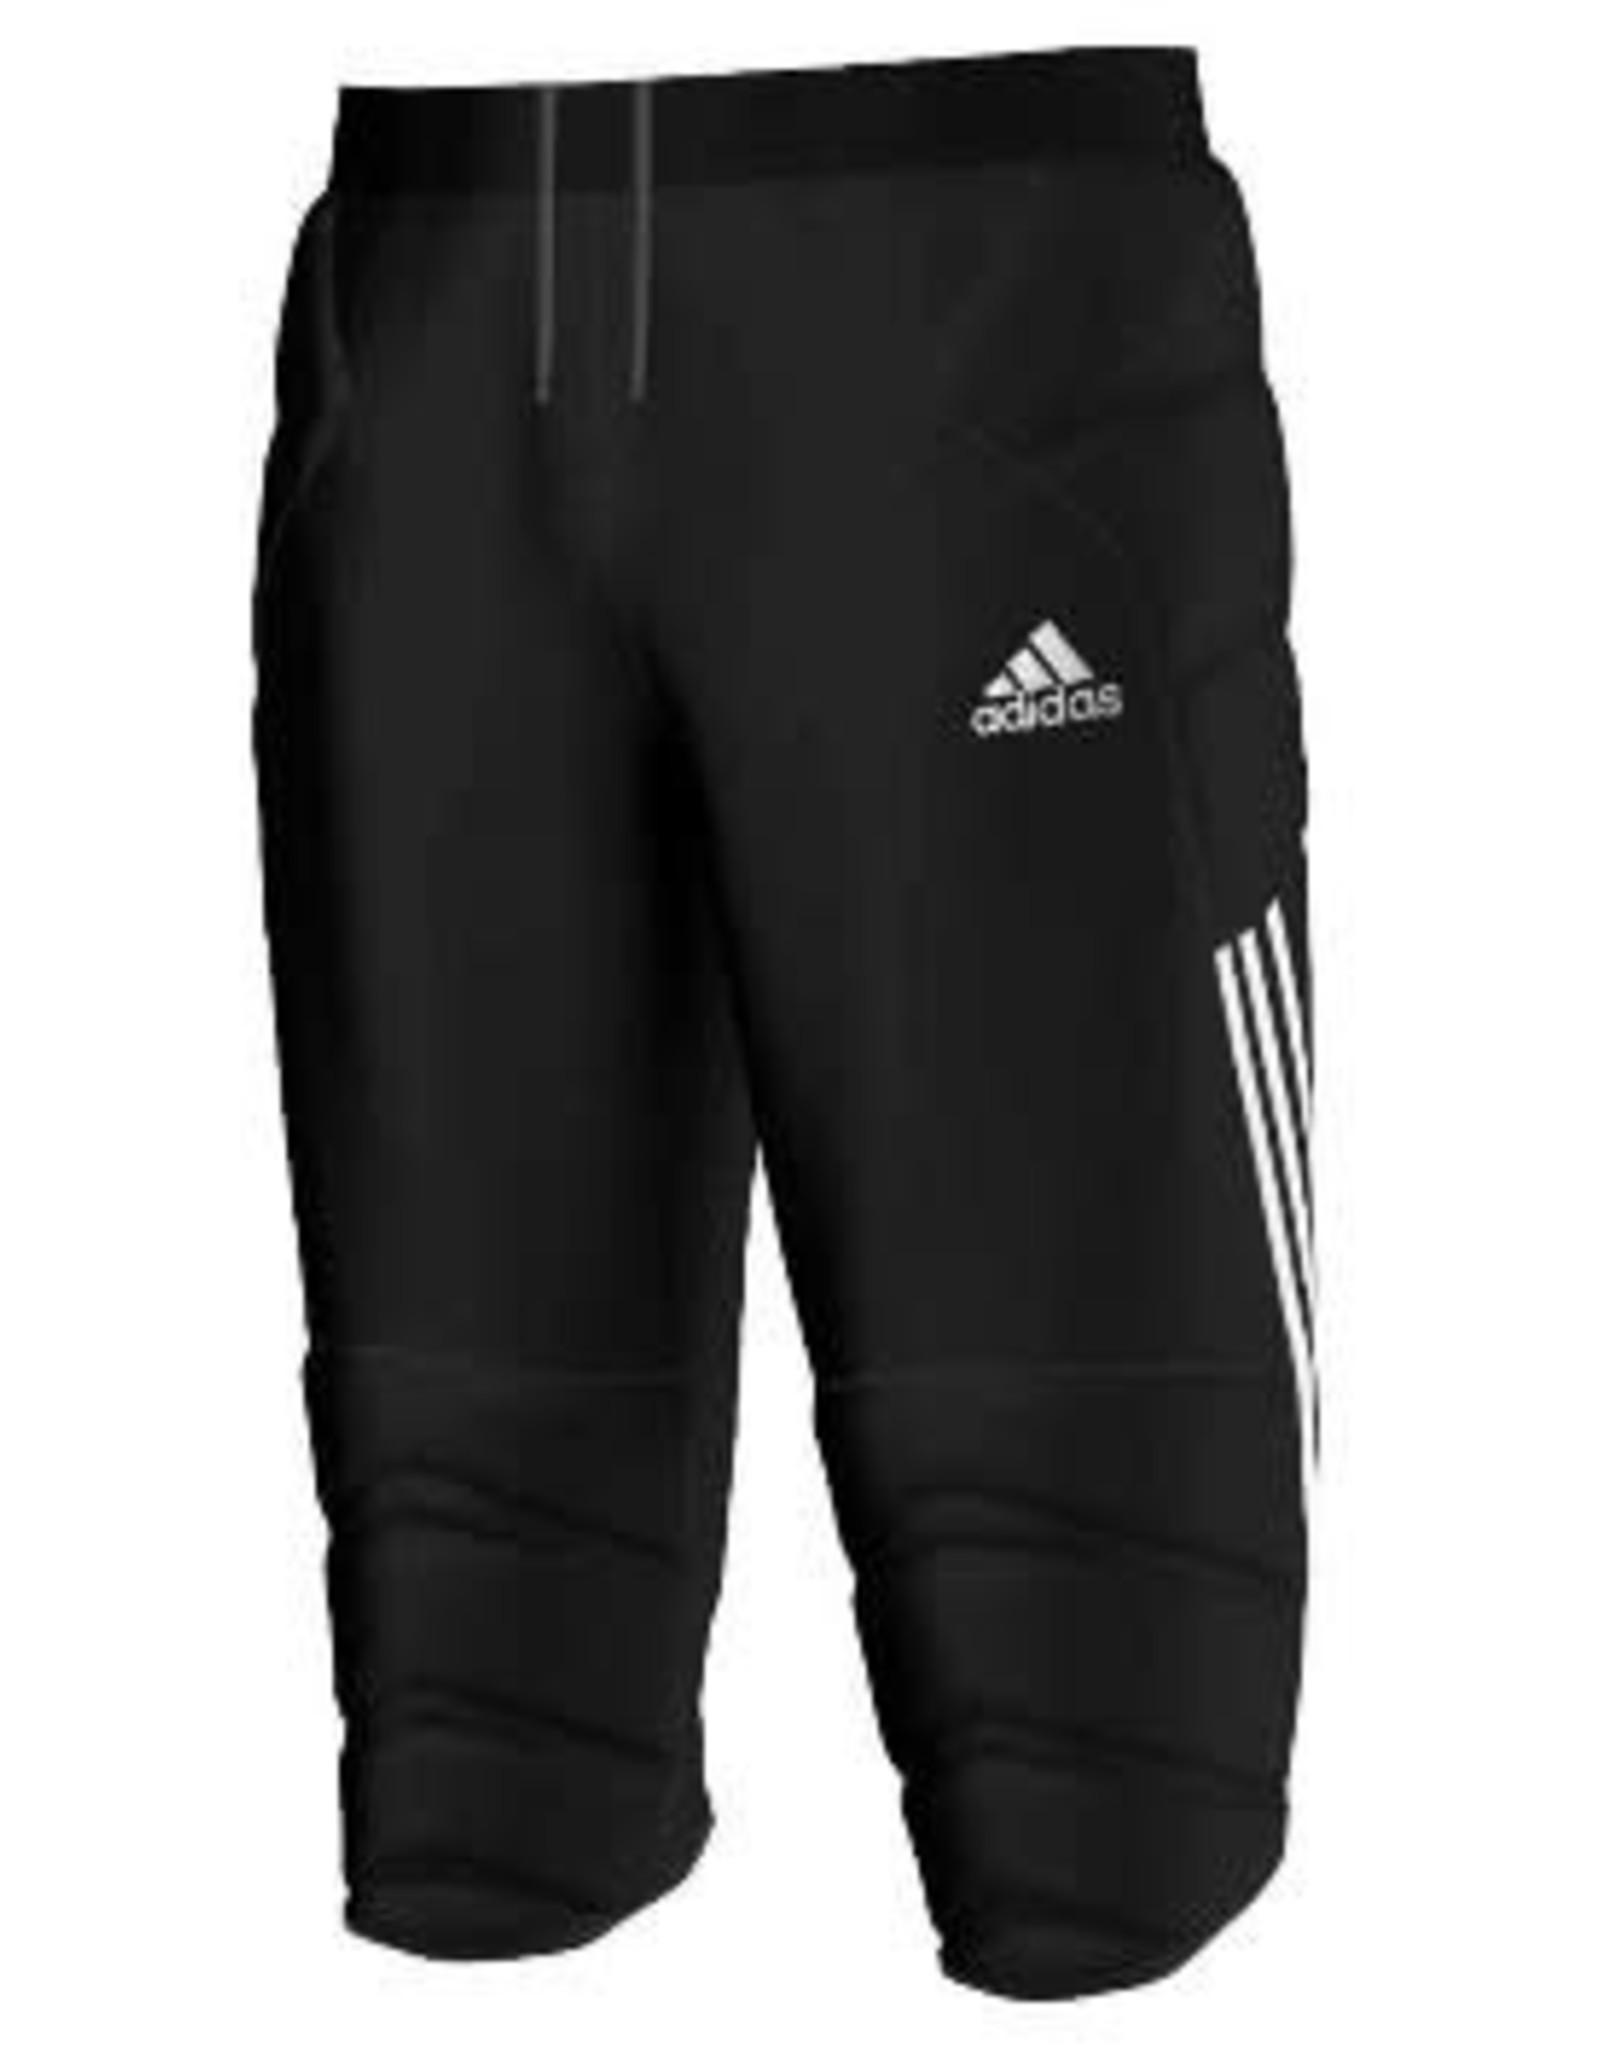 Adidas Adidas Tierro 13 Goalkeeper 3/4 Pant